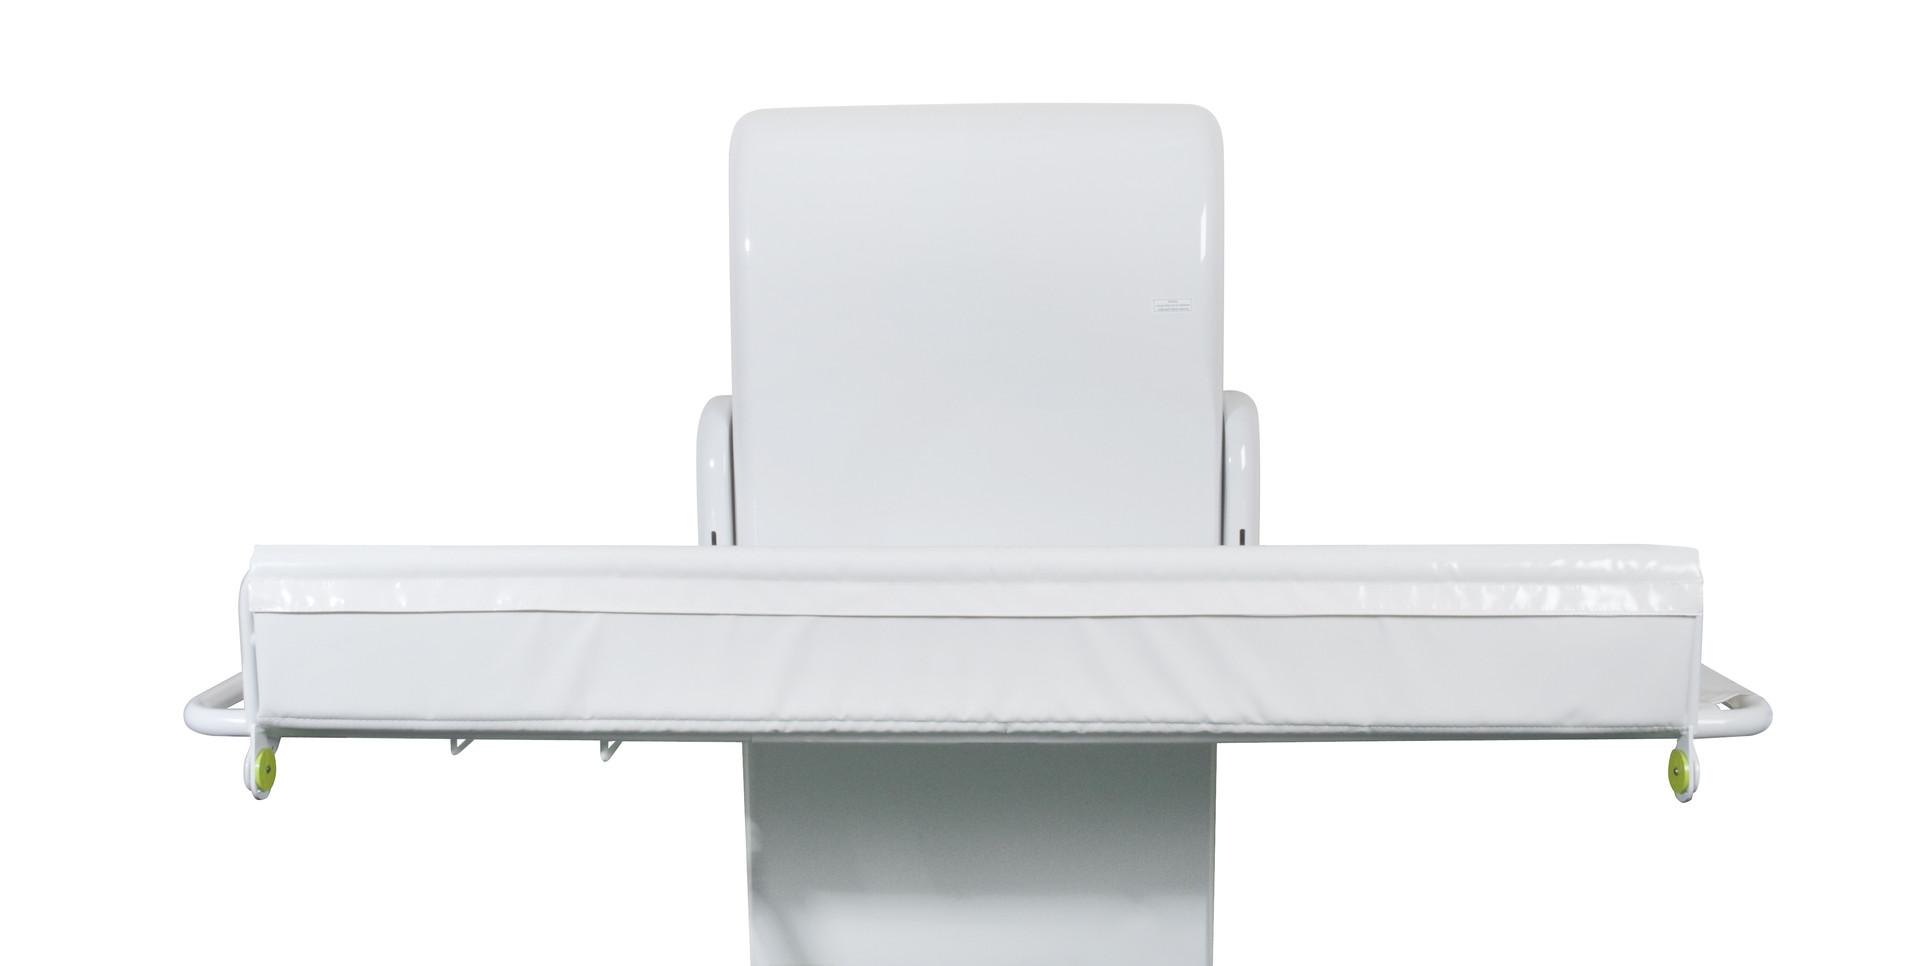 Nivano CTE2 Changing Table